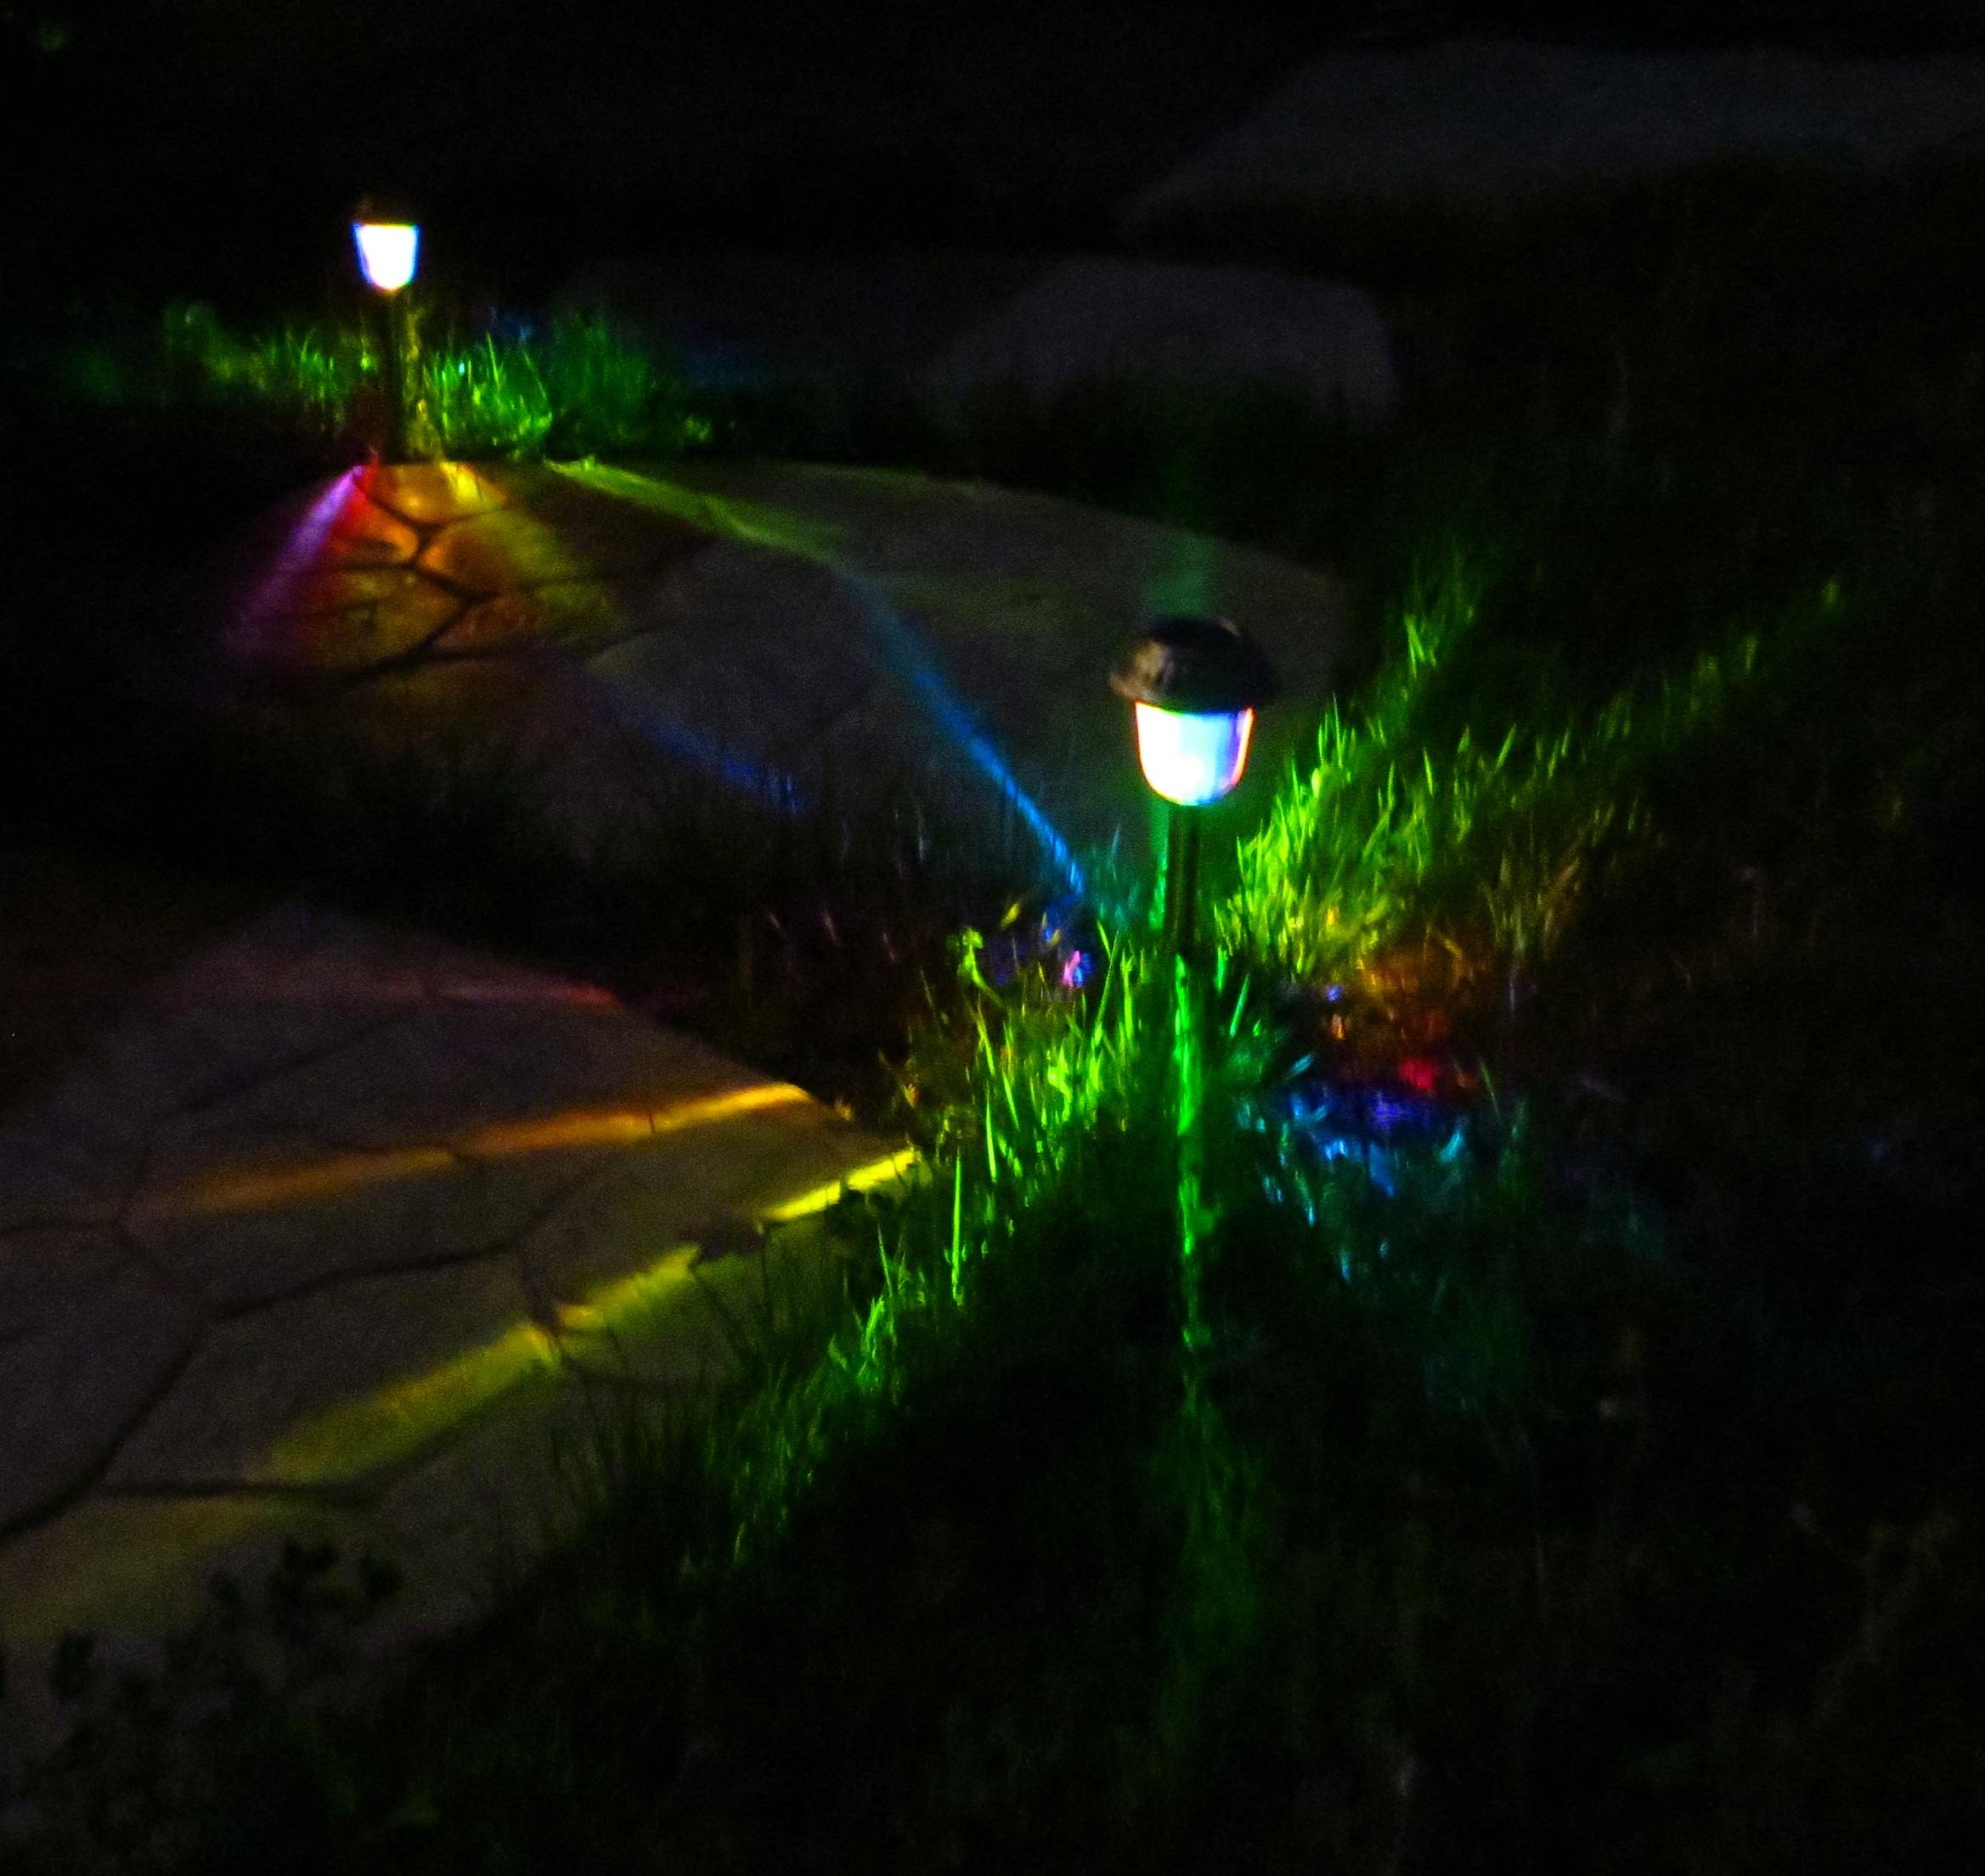 Dark Imagine Rainbow Colored Lights Marking Your Path Solar Rainbow Path Lights Solar Path Lights Solar Path Lights Rechargeable Batteries houzz 01 Solar Path Lights